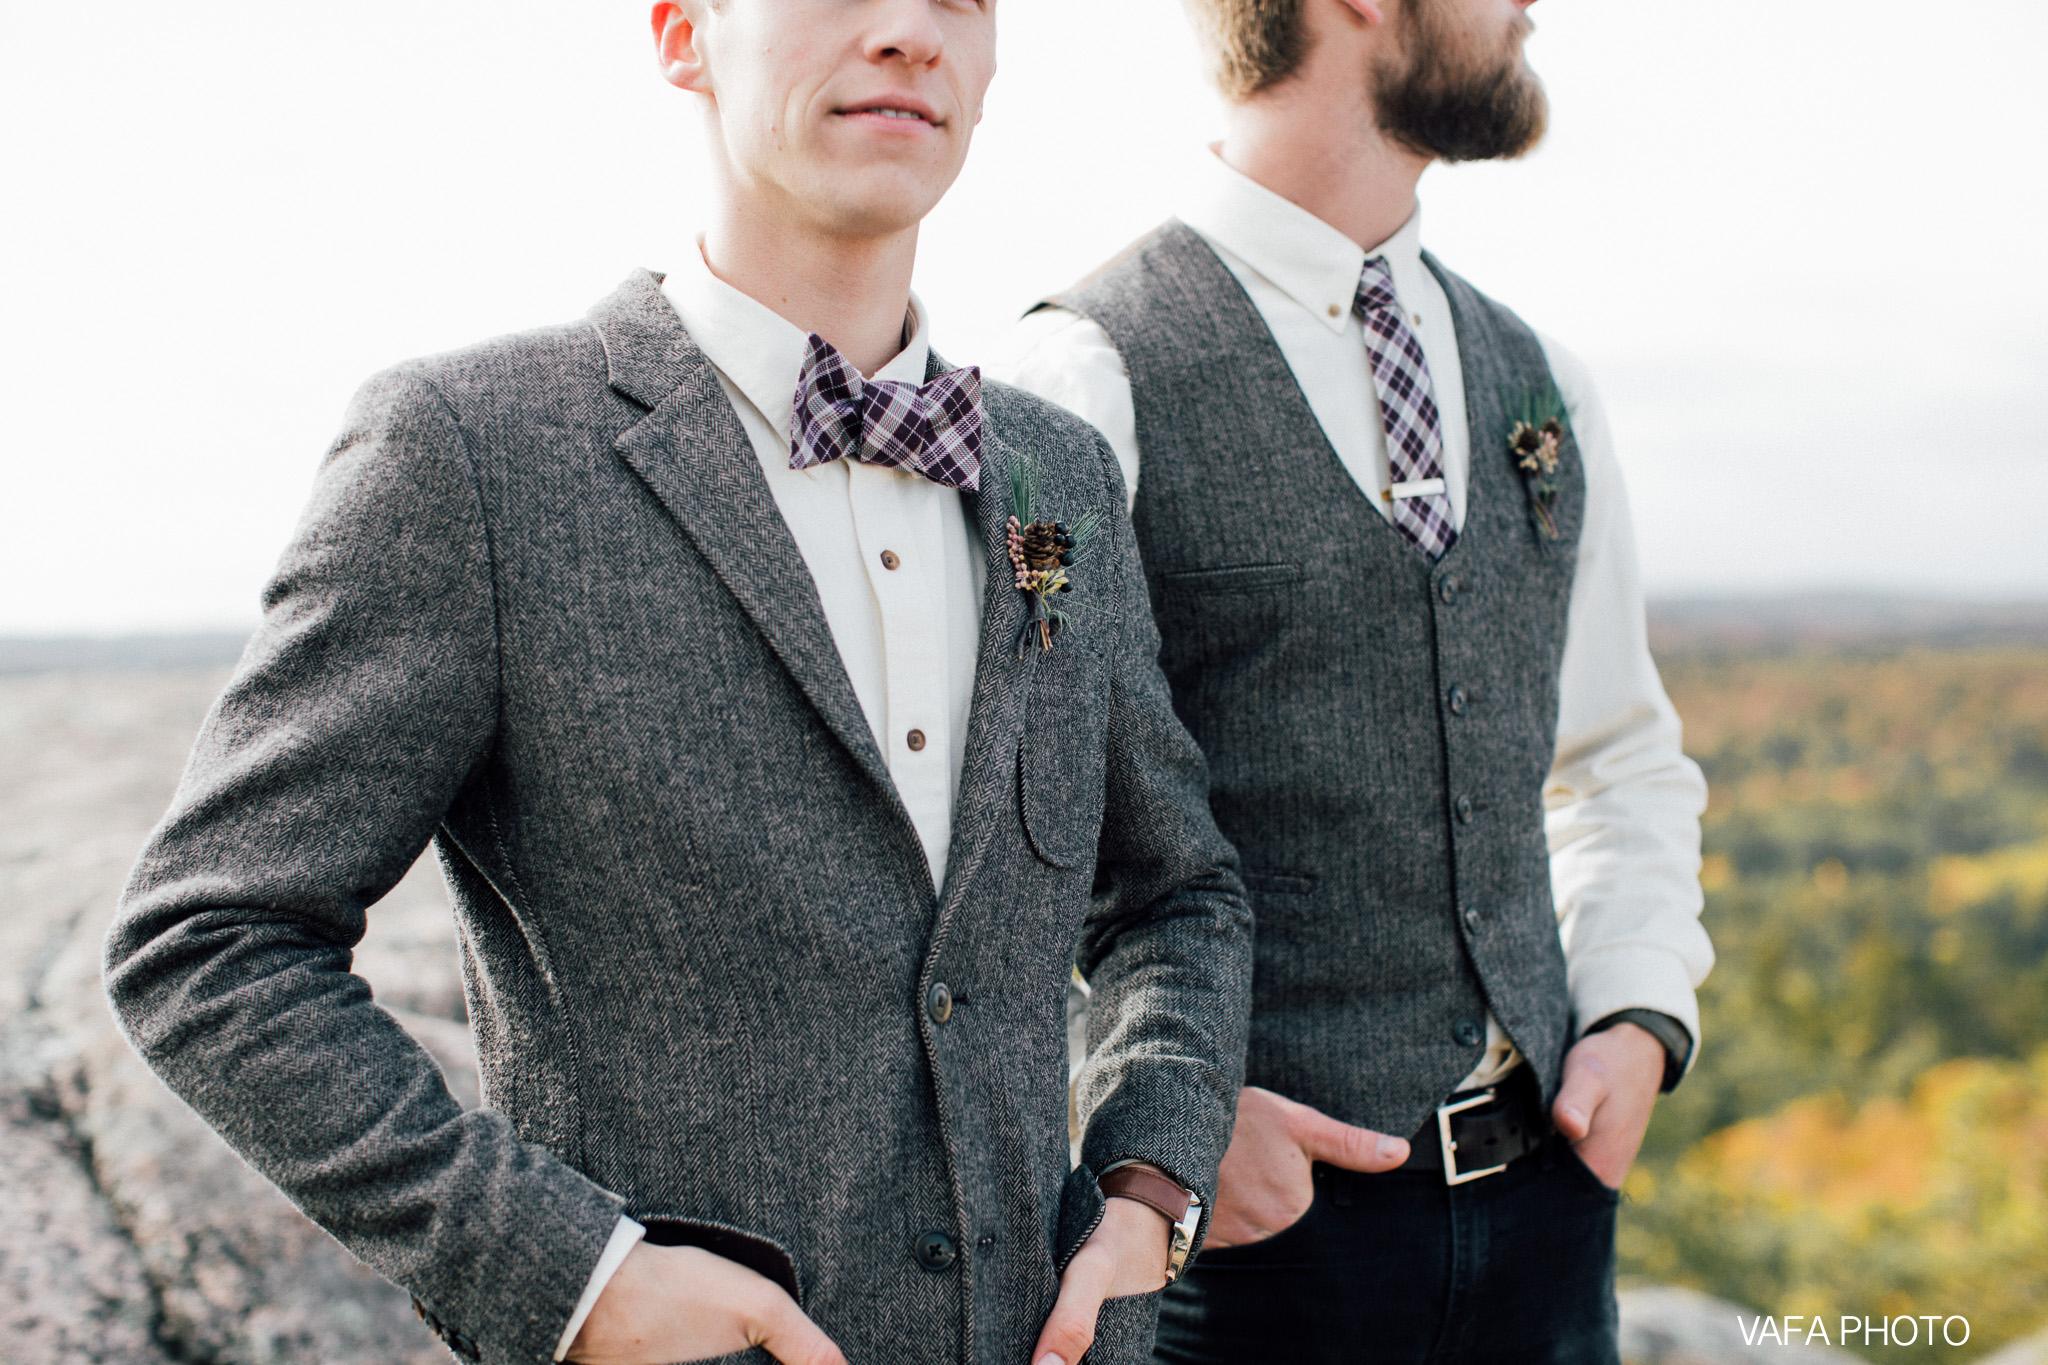 Hogback-Mountain-Wedding-Chelsea-Josh-Vafa-Photo-338.jpg